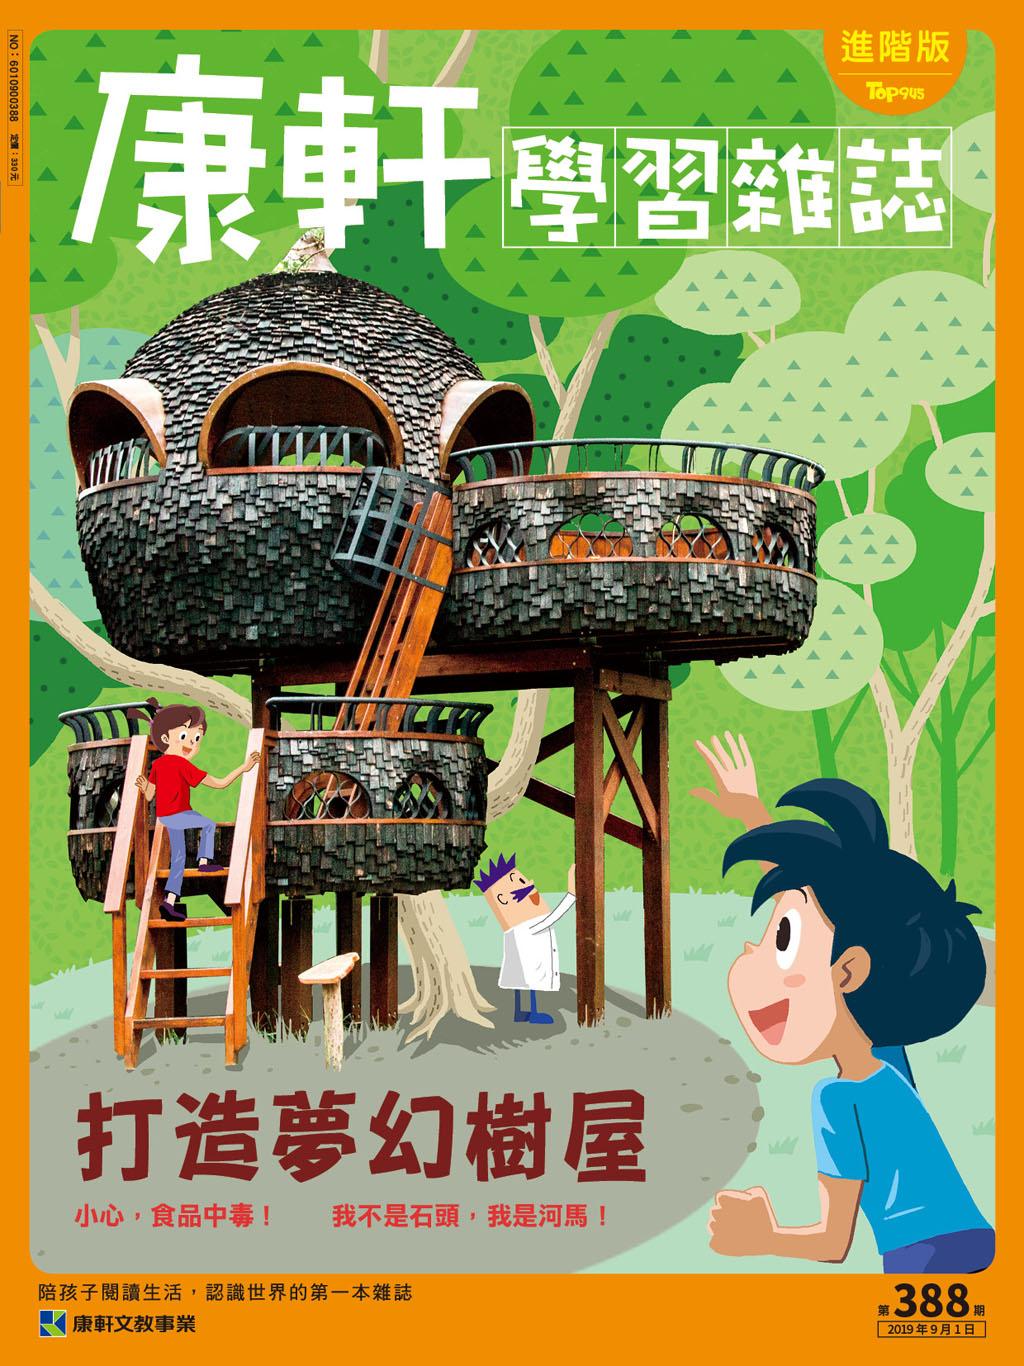 Top945康軒學習雜誌進階版 2019/9/1第388期